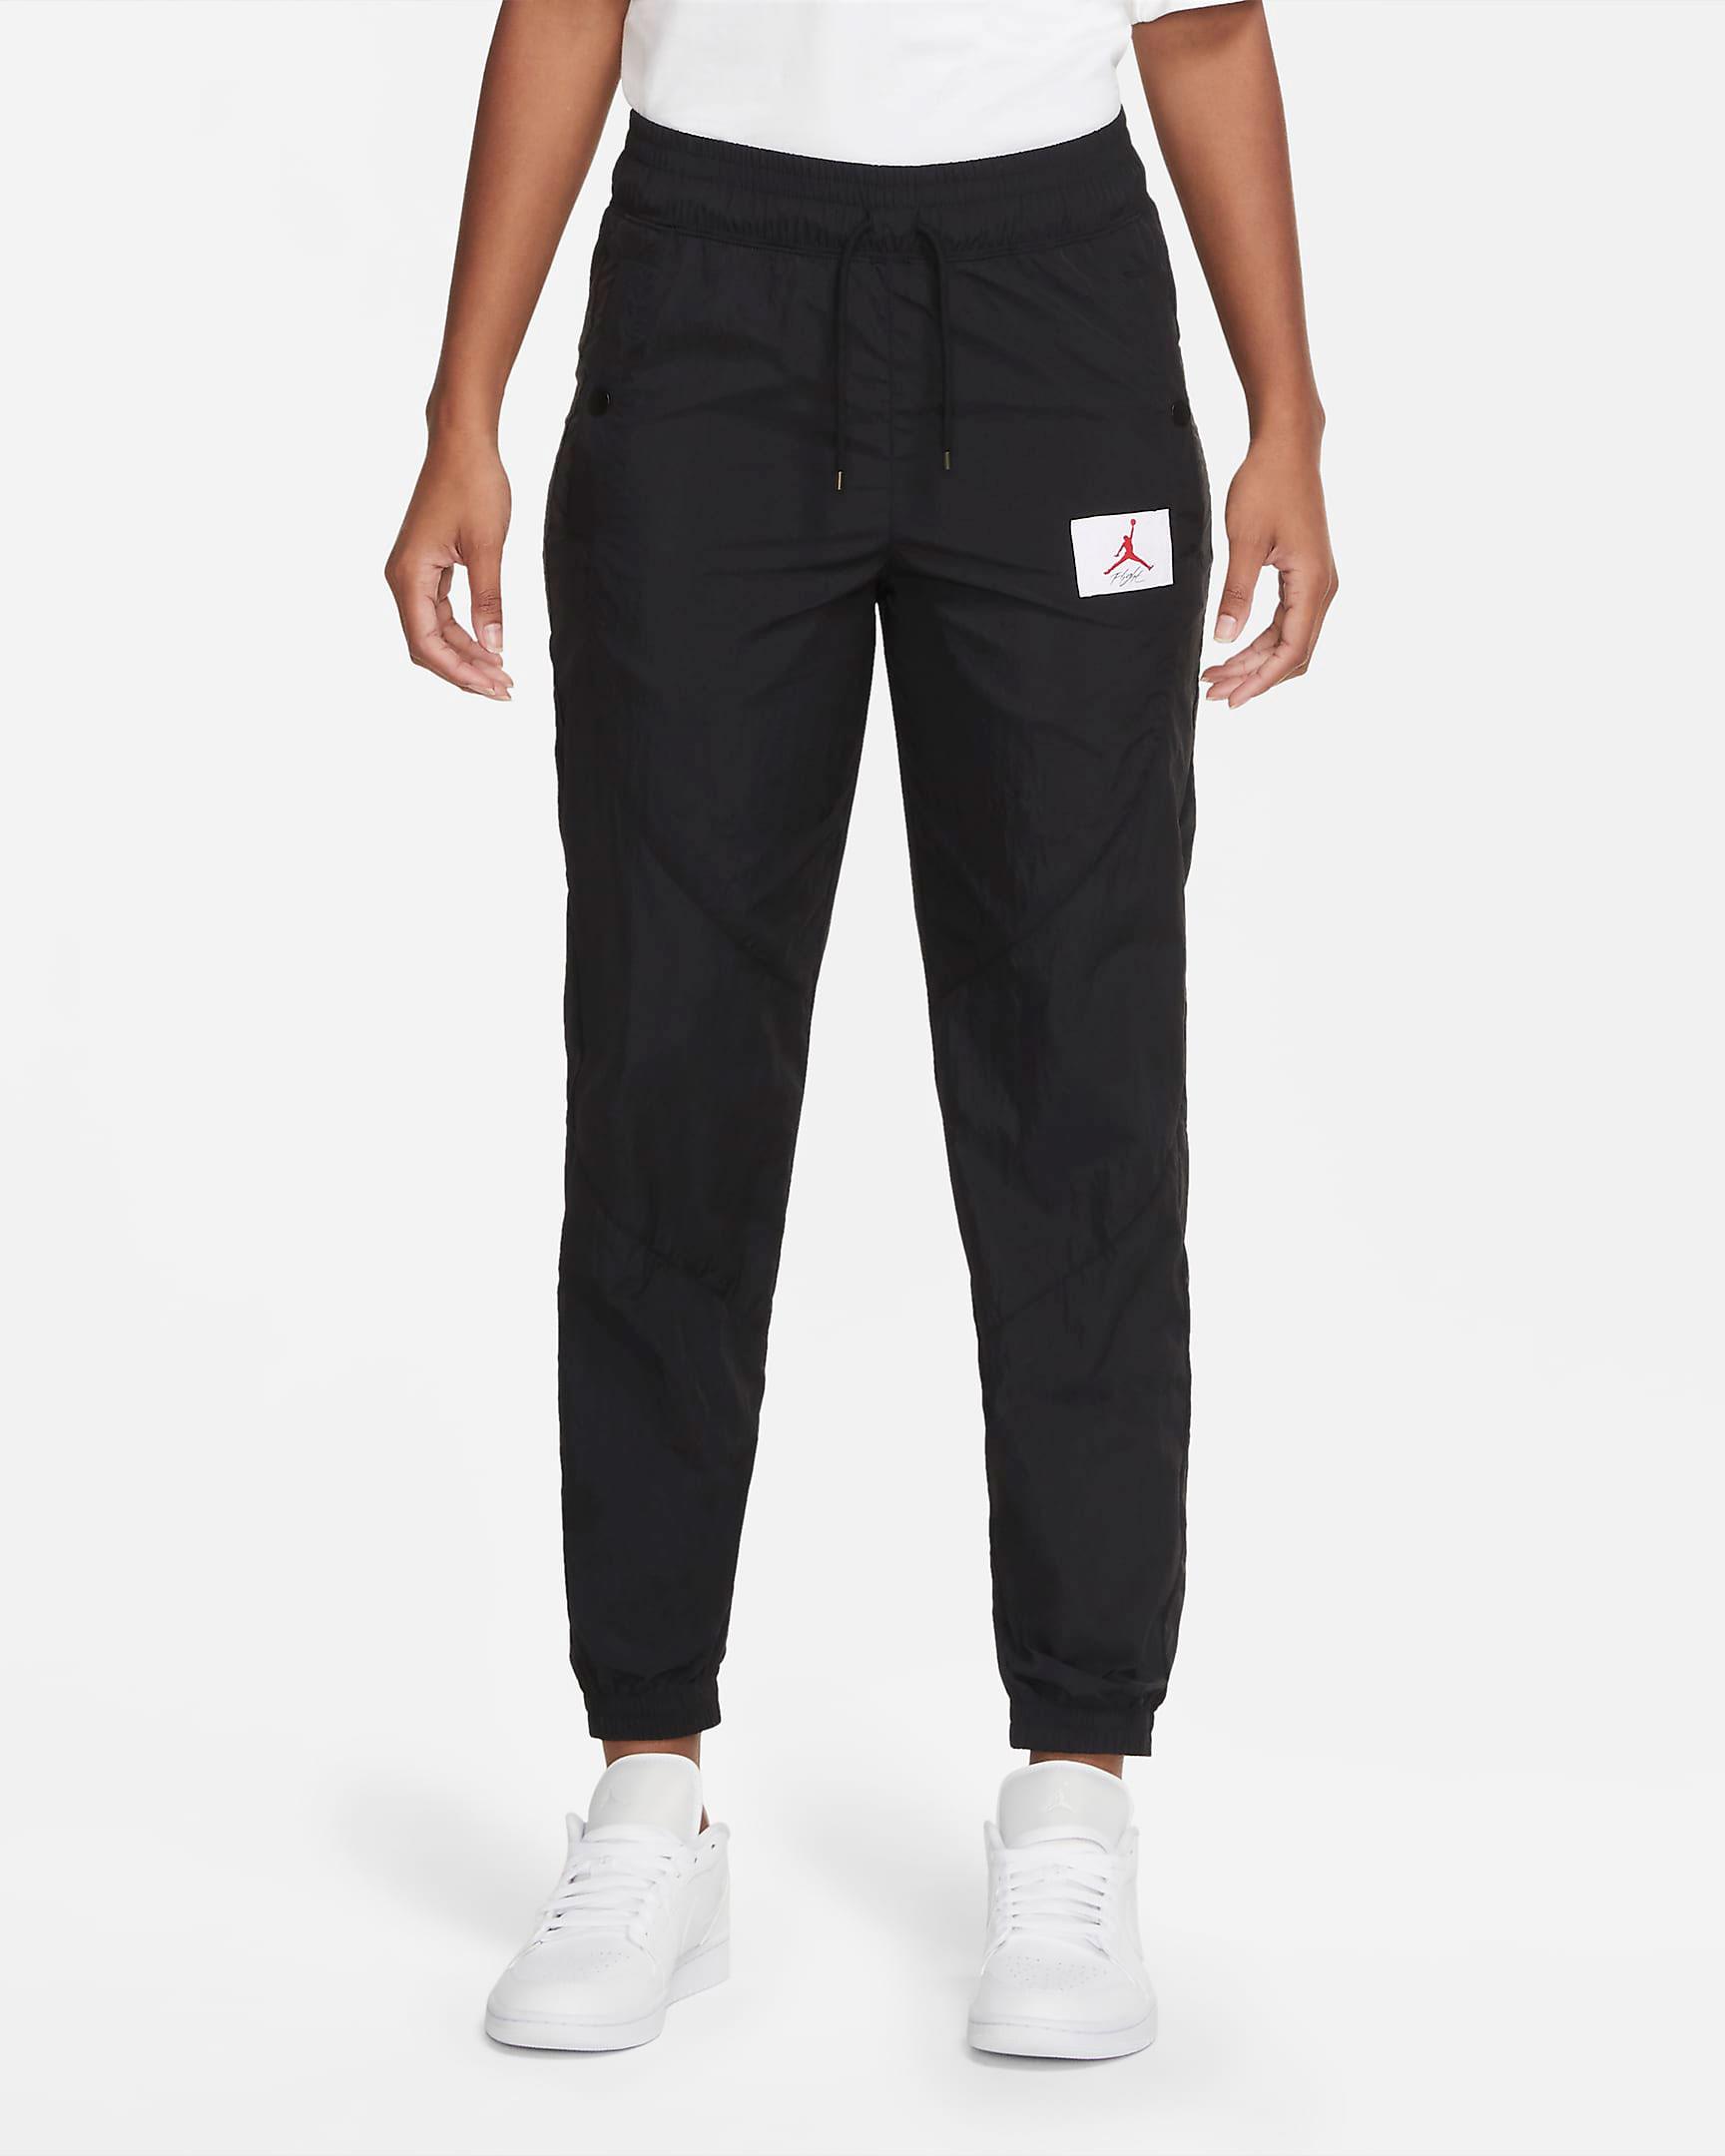 jordan-womens-woven-pants-black